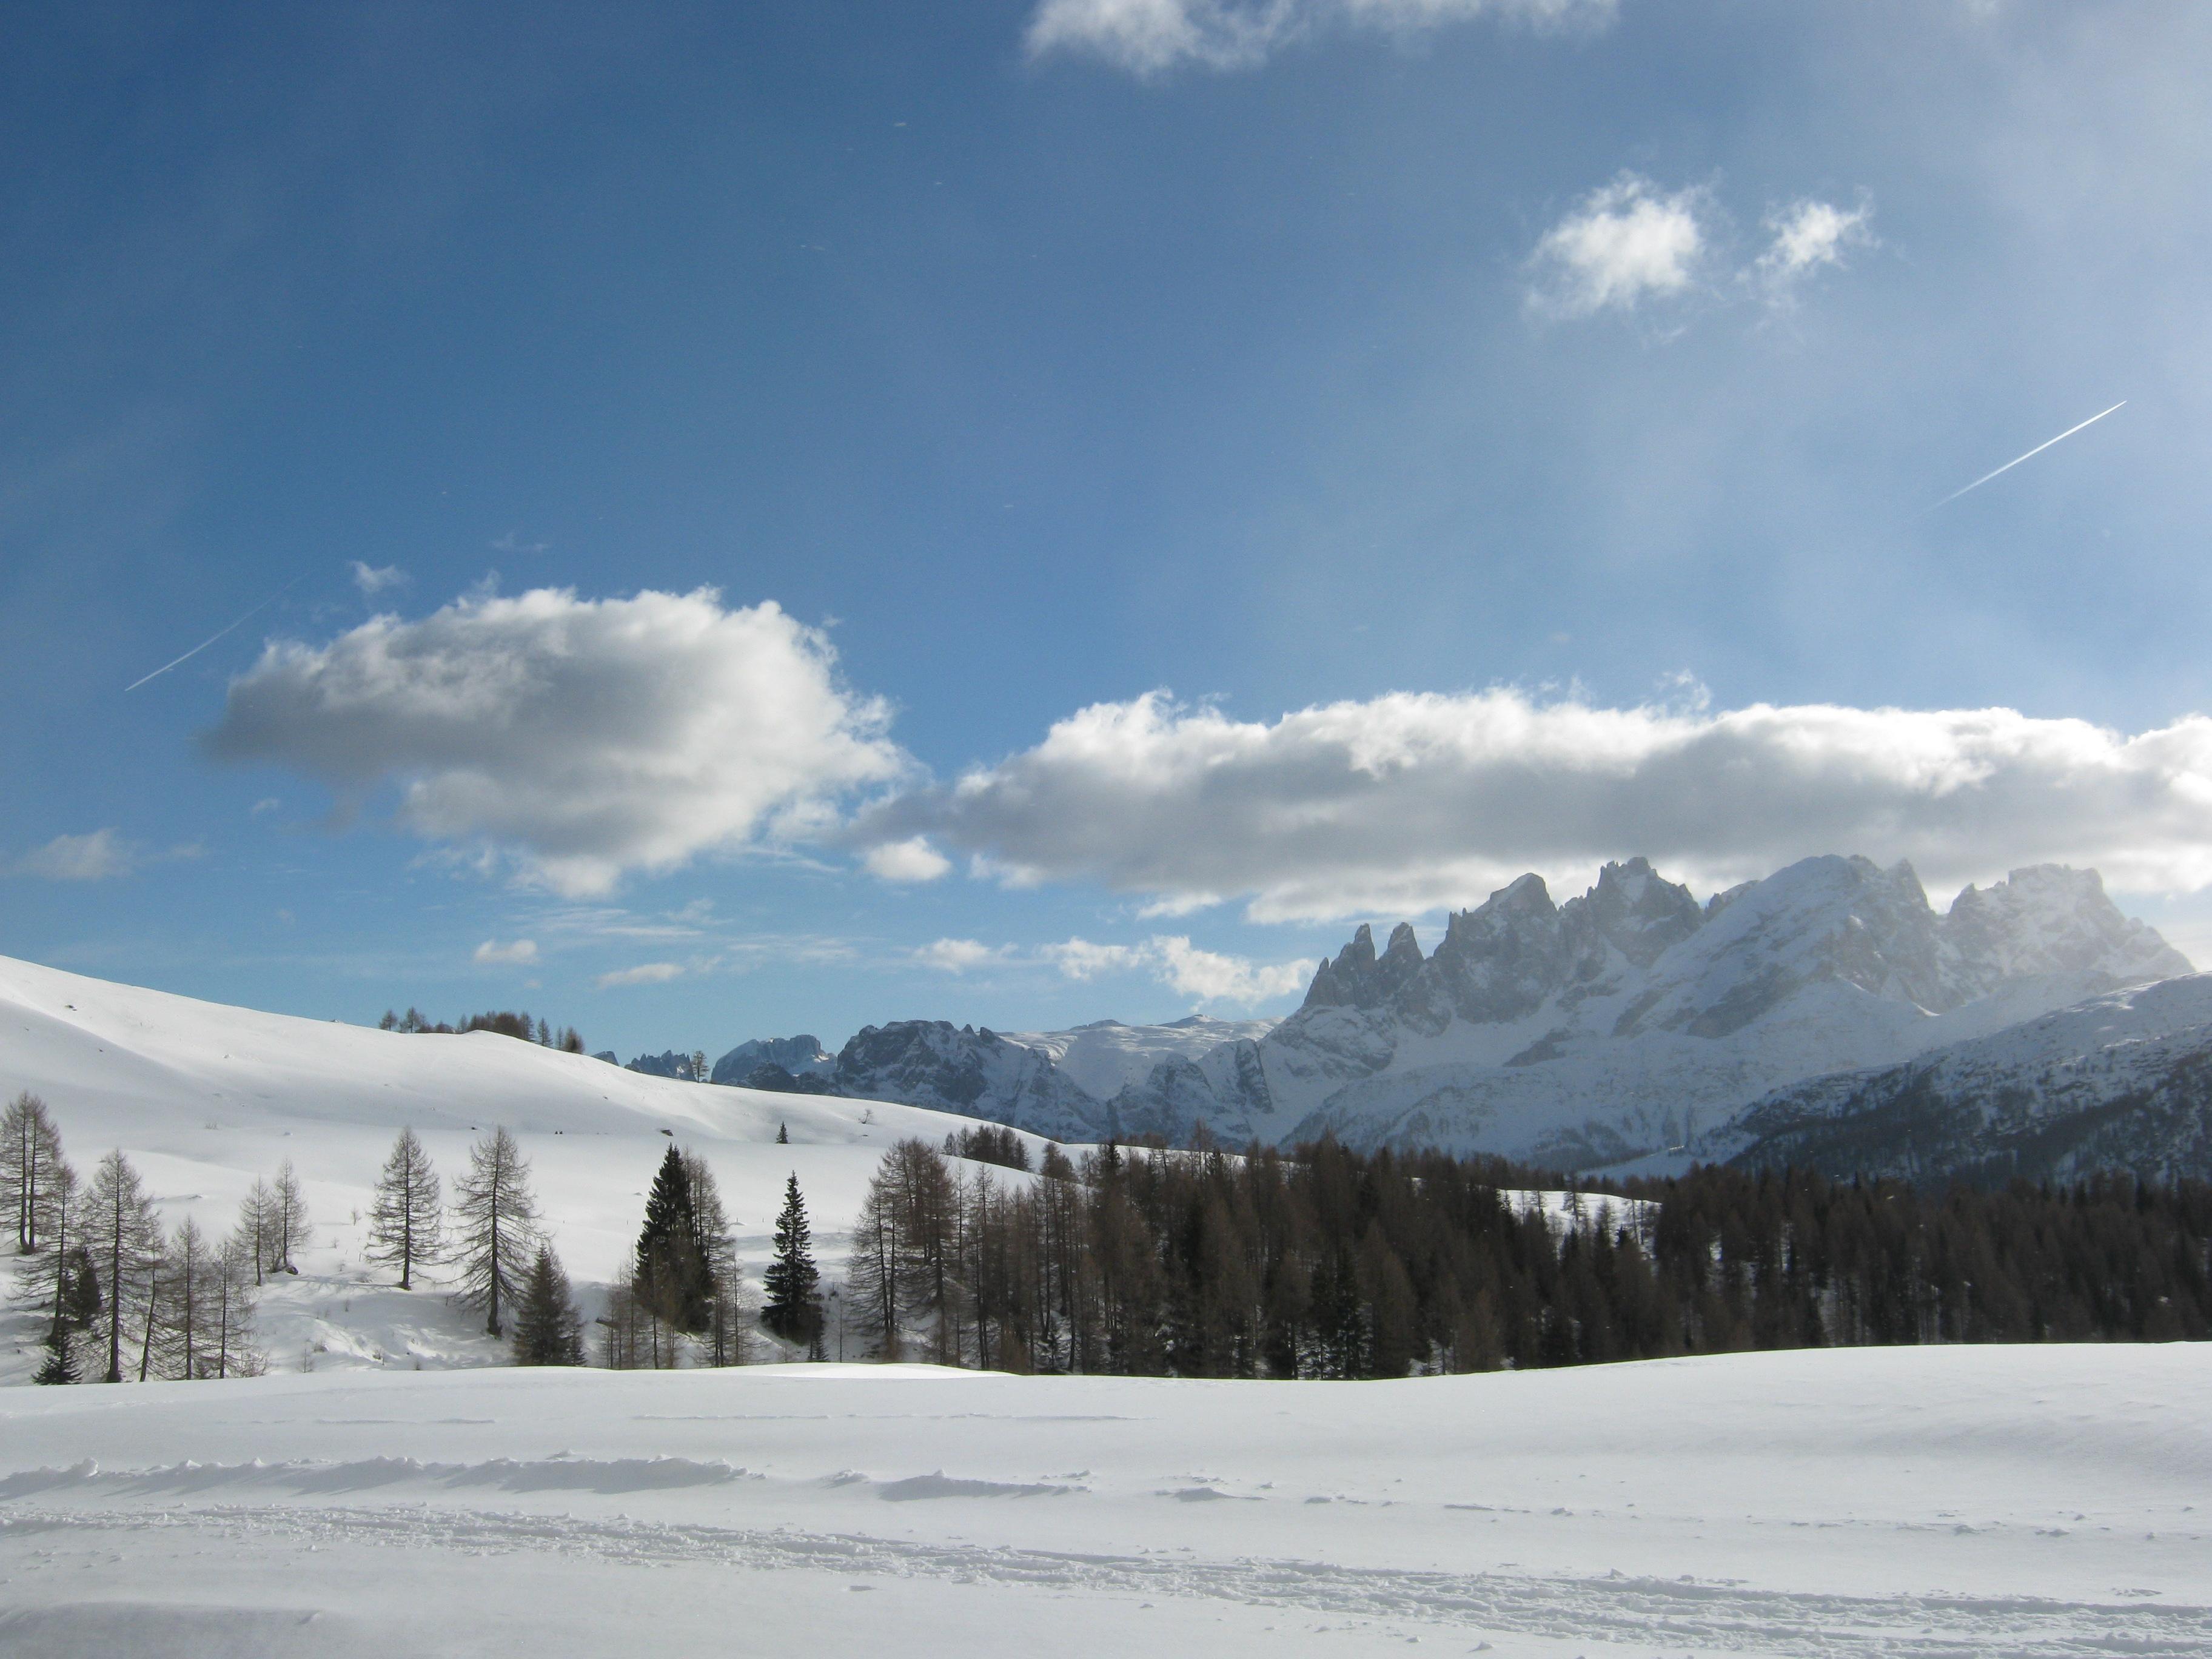 snow land by Larcheex-Clicexia